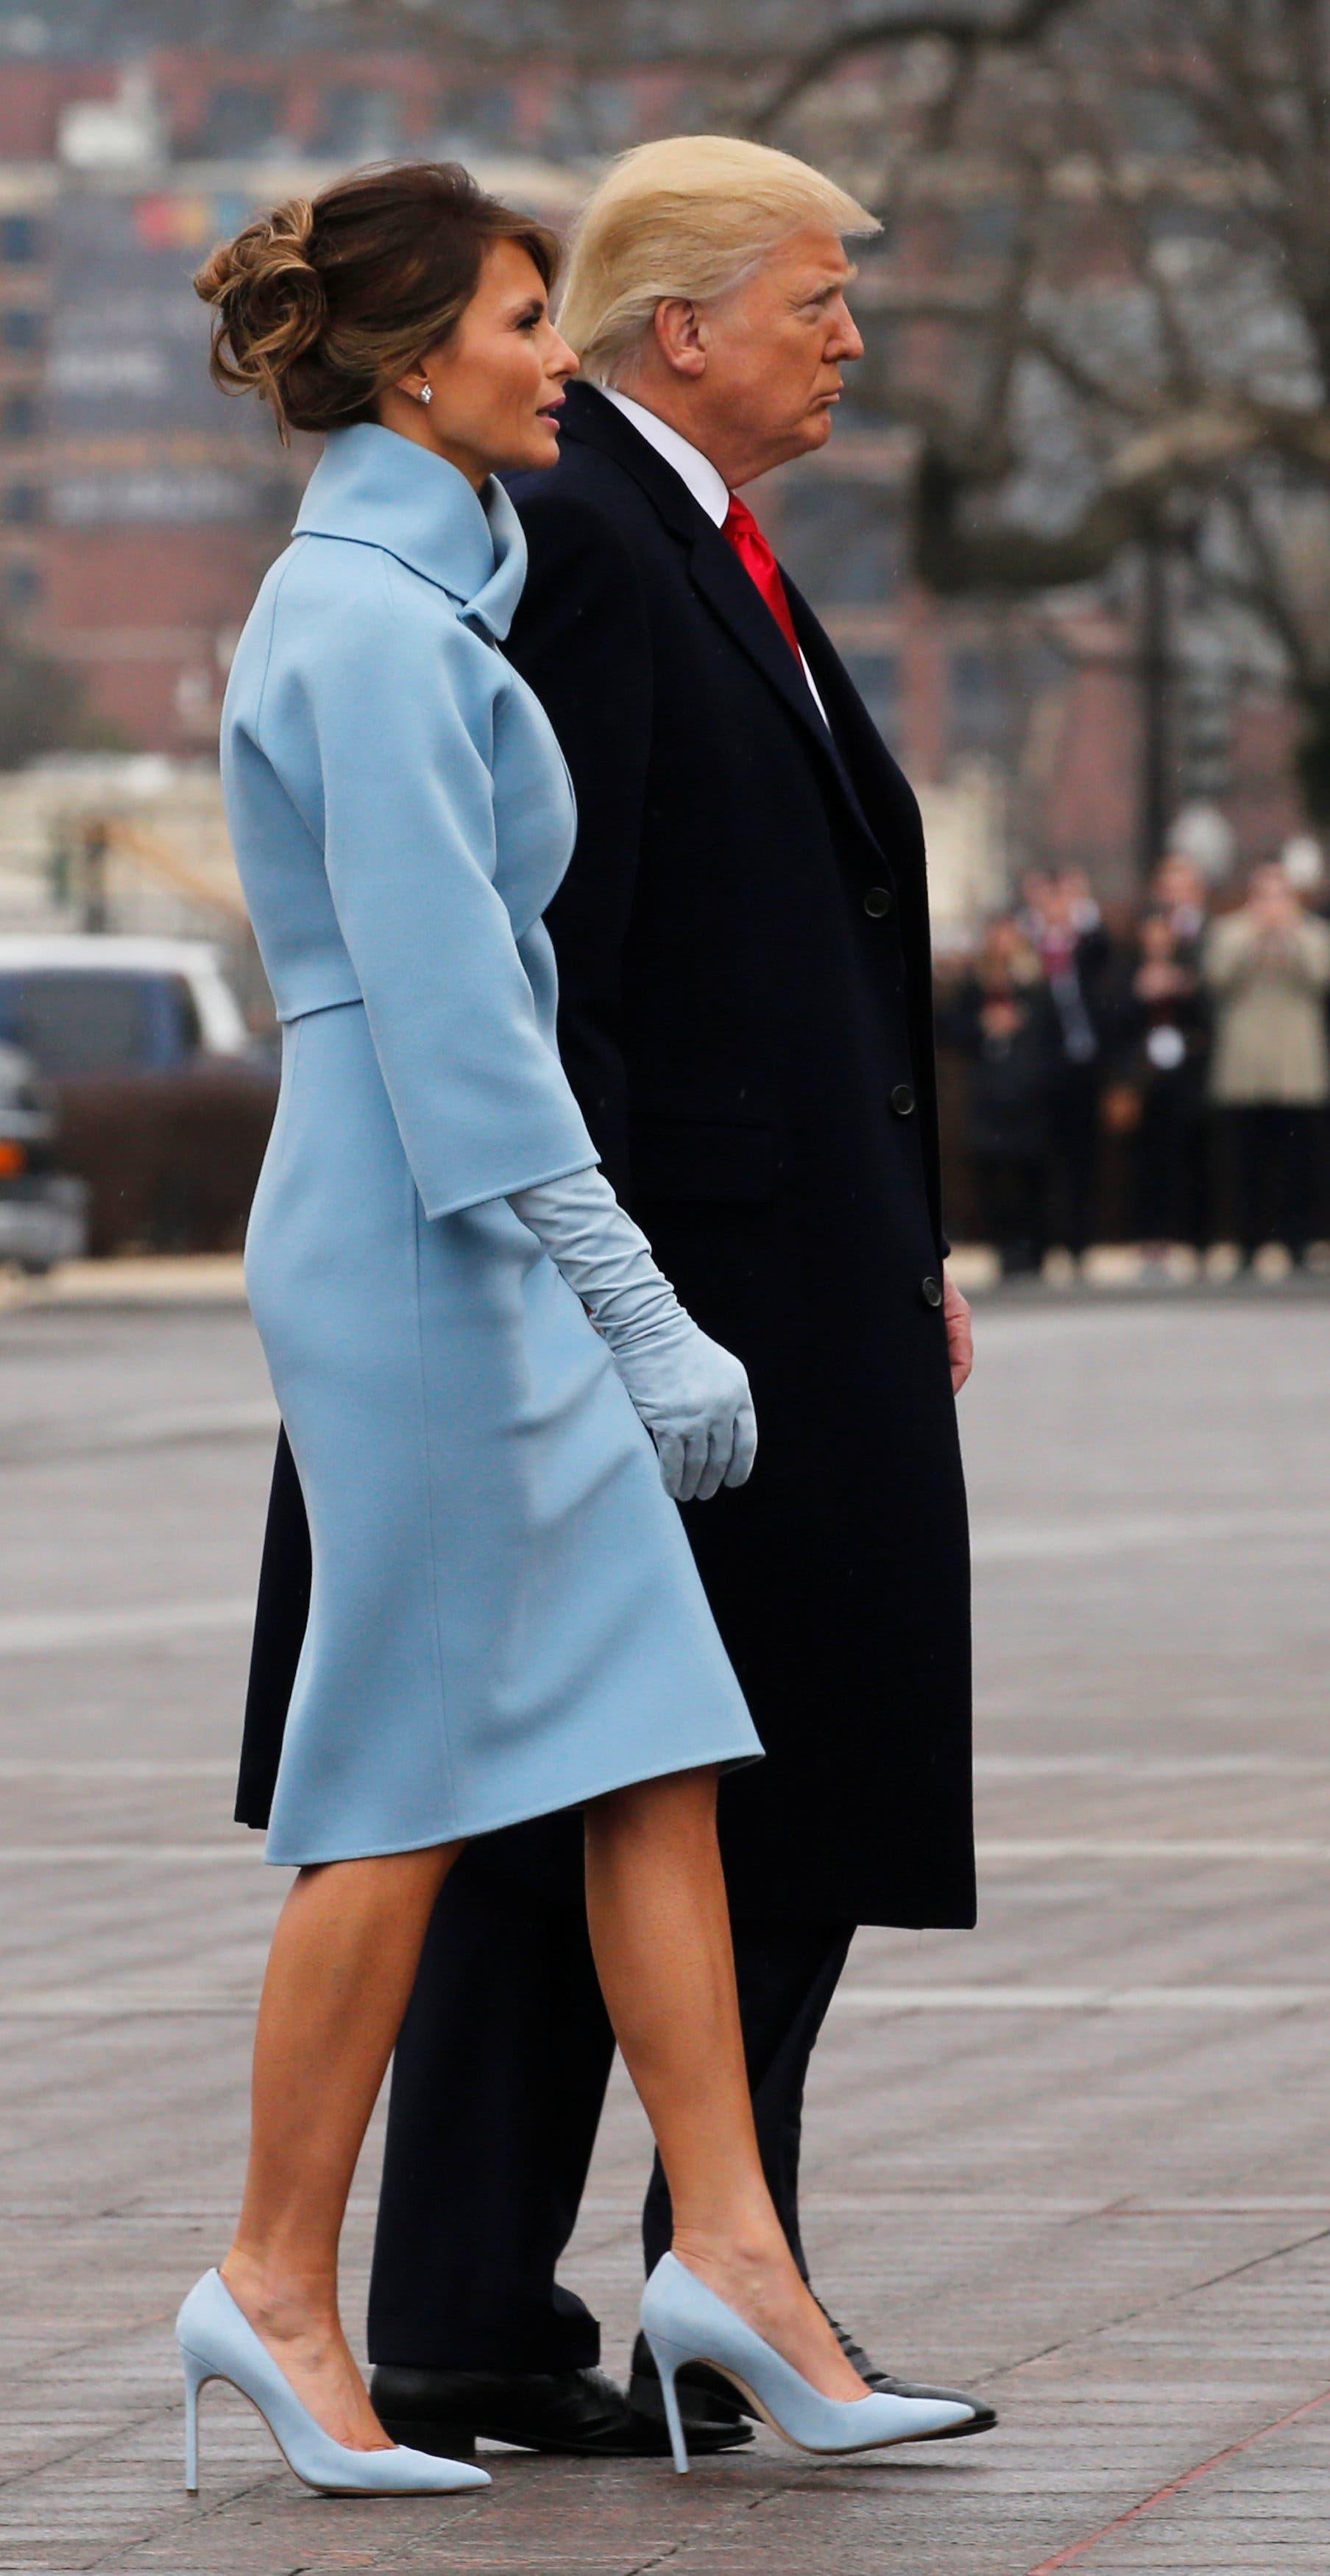 الرئيس ترمب وزوجته ميلانيا